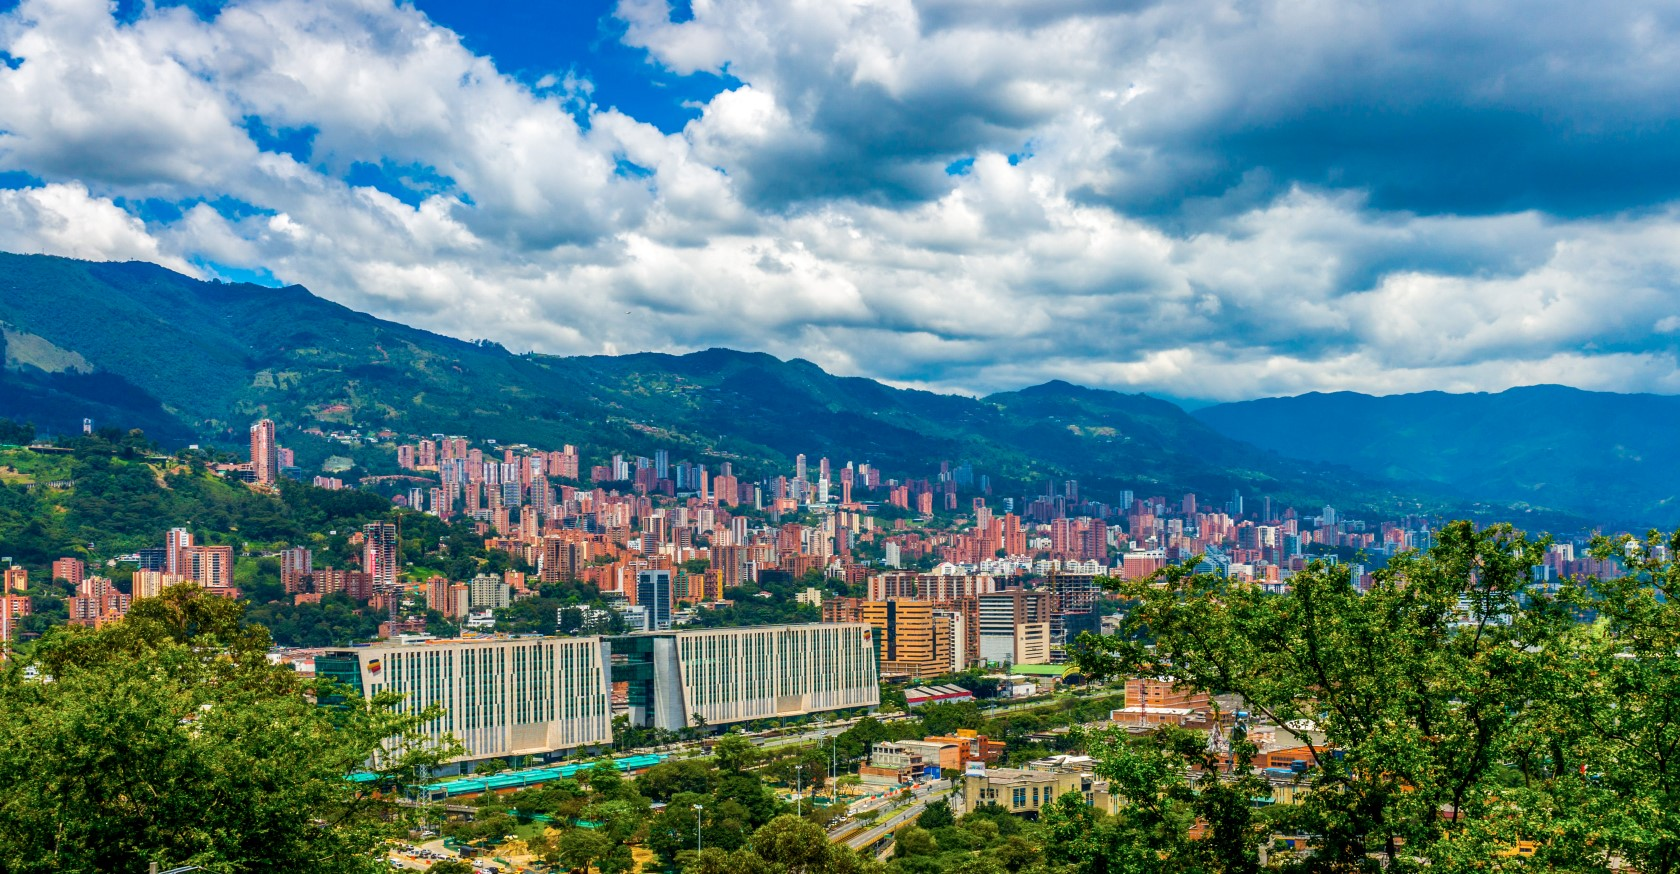 Elevation Of Medellin Antioquia Colombia Topographic